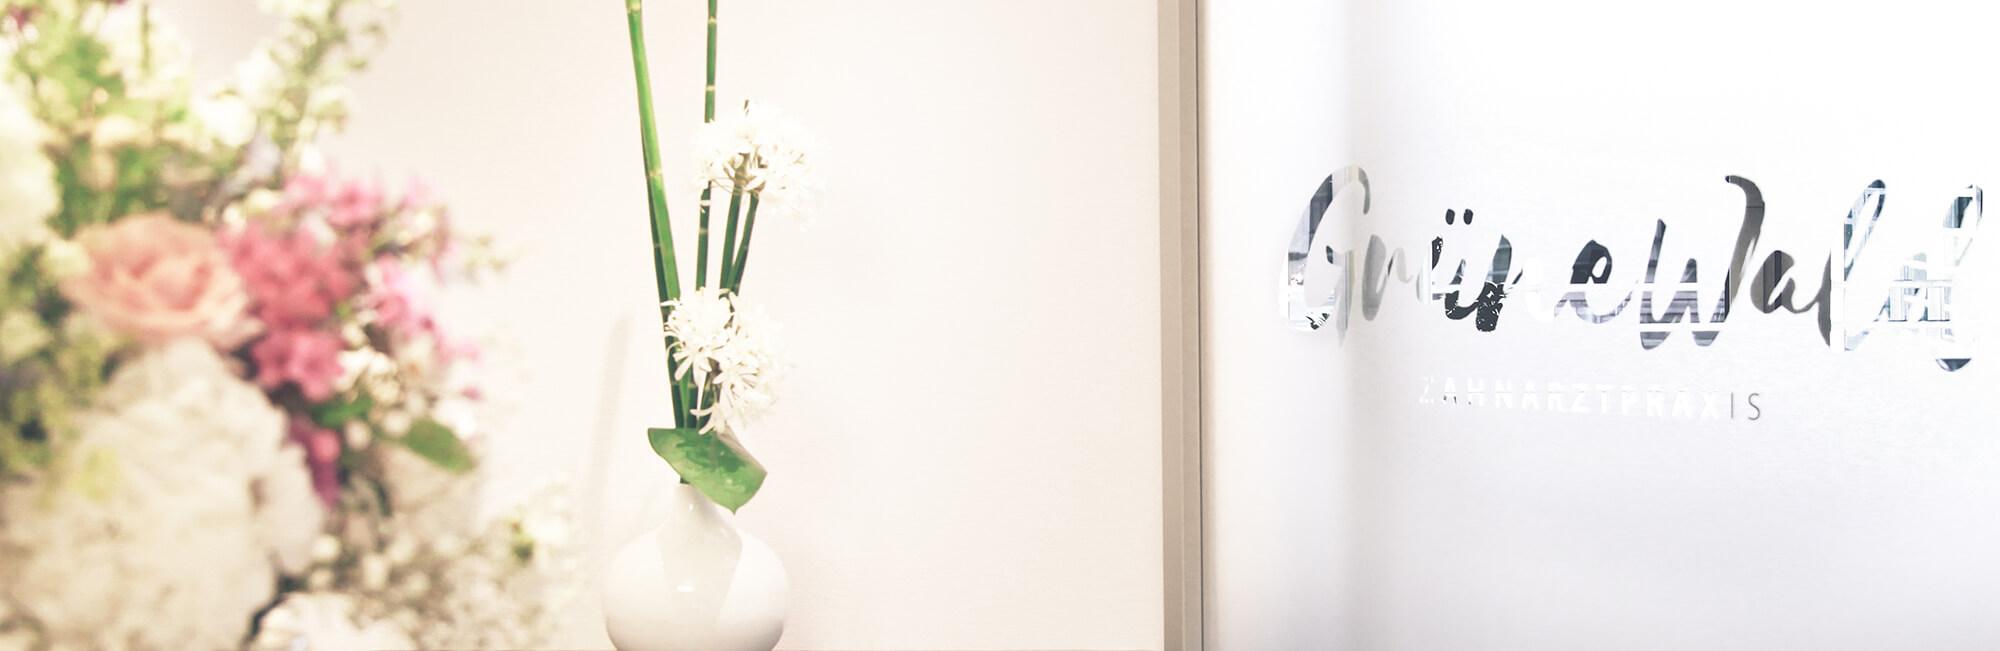 Zahnarzt Potsdam - Grünewald - Praxis Slider Empfang mit Logo